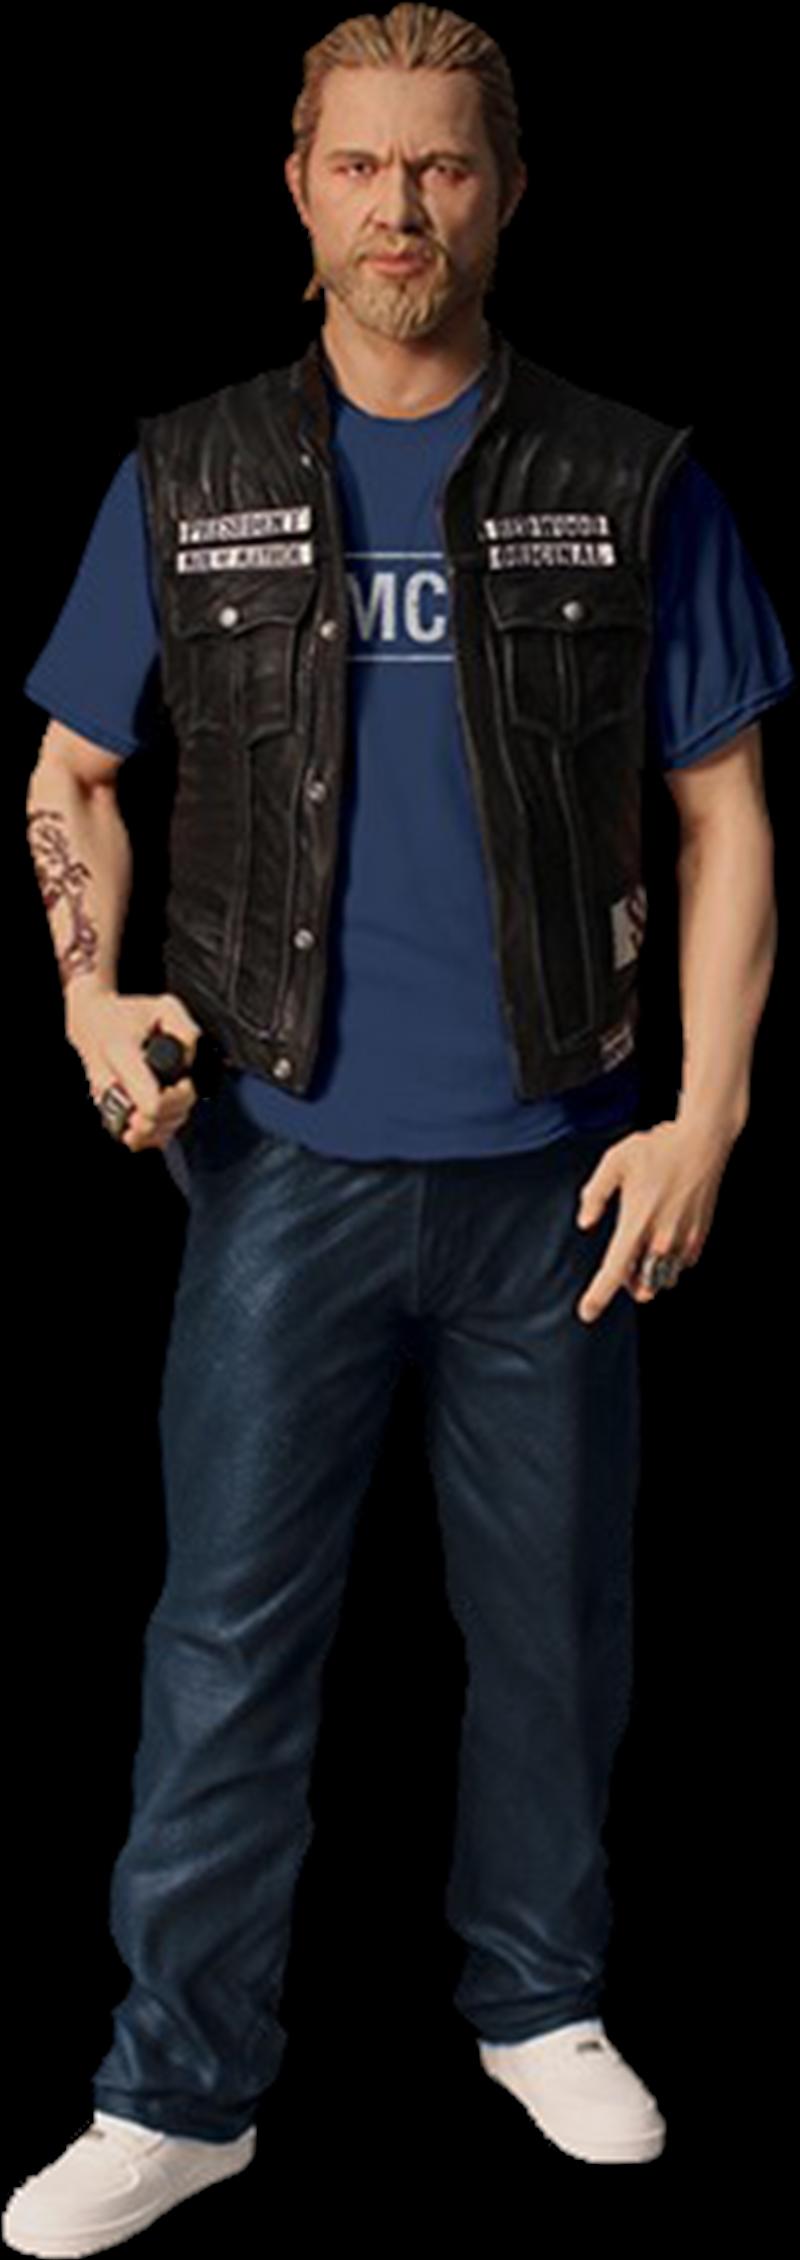 "Sons of Anarchy - Jax (SAMCRO Shirt) 6"" Action Figure   Merchandise"